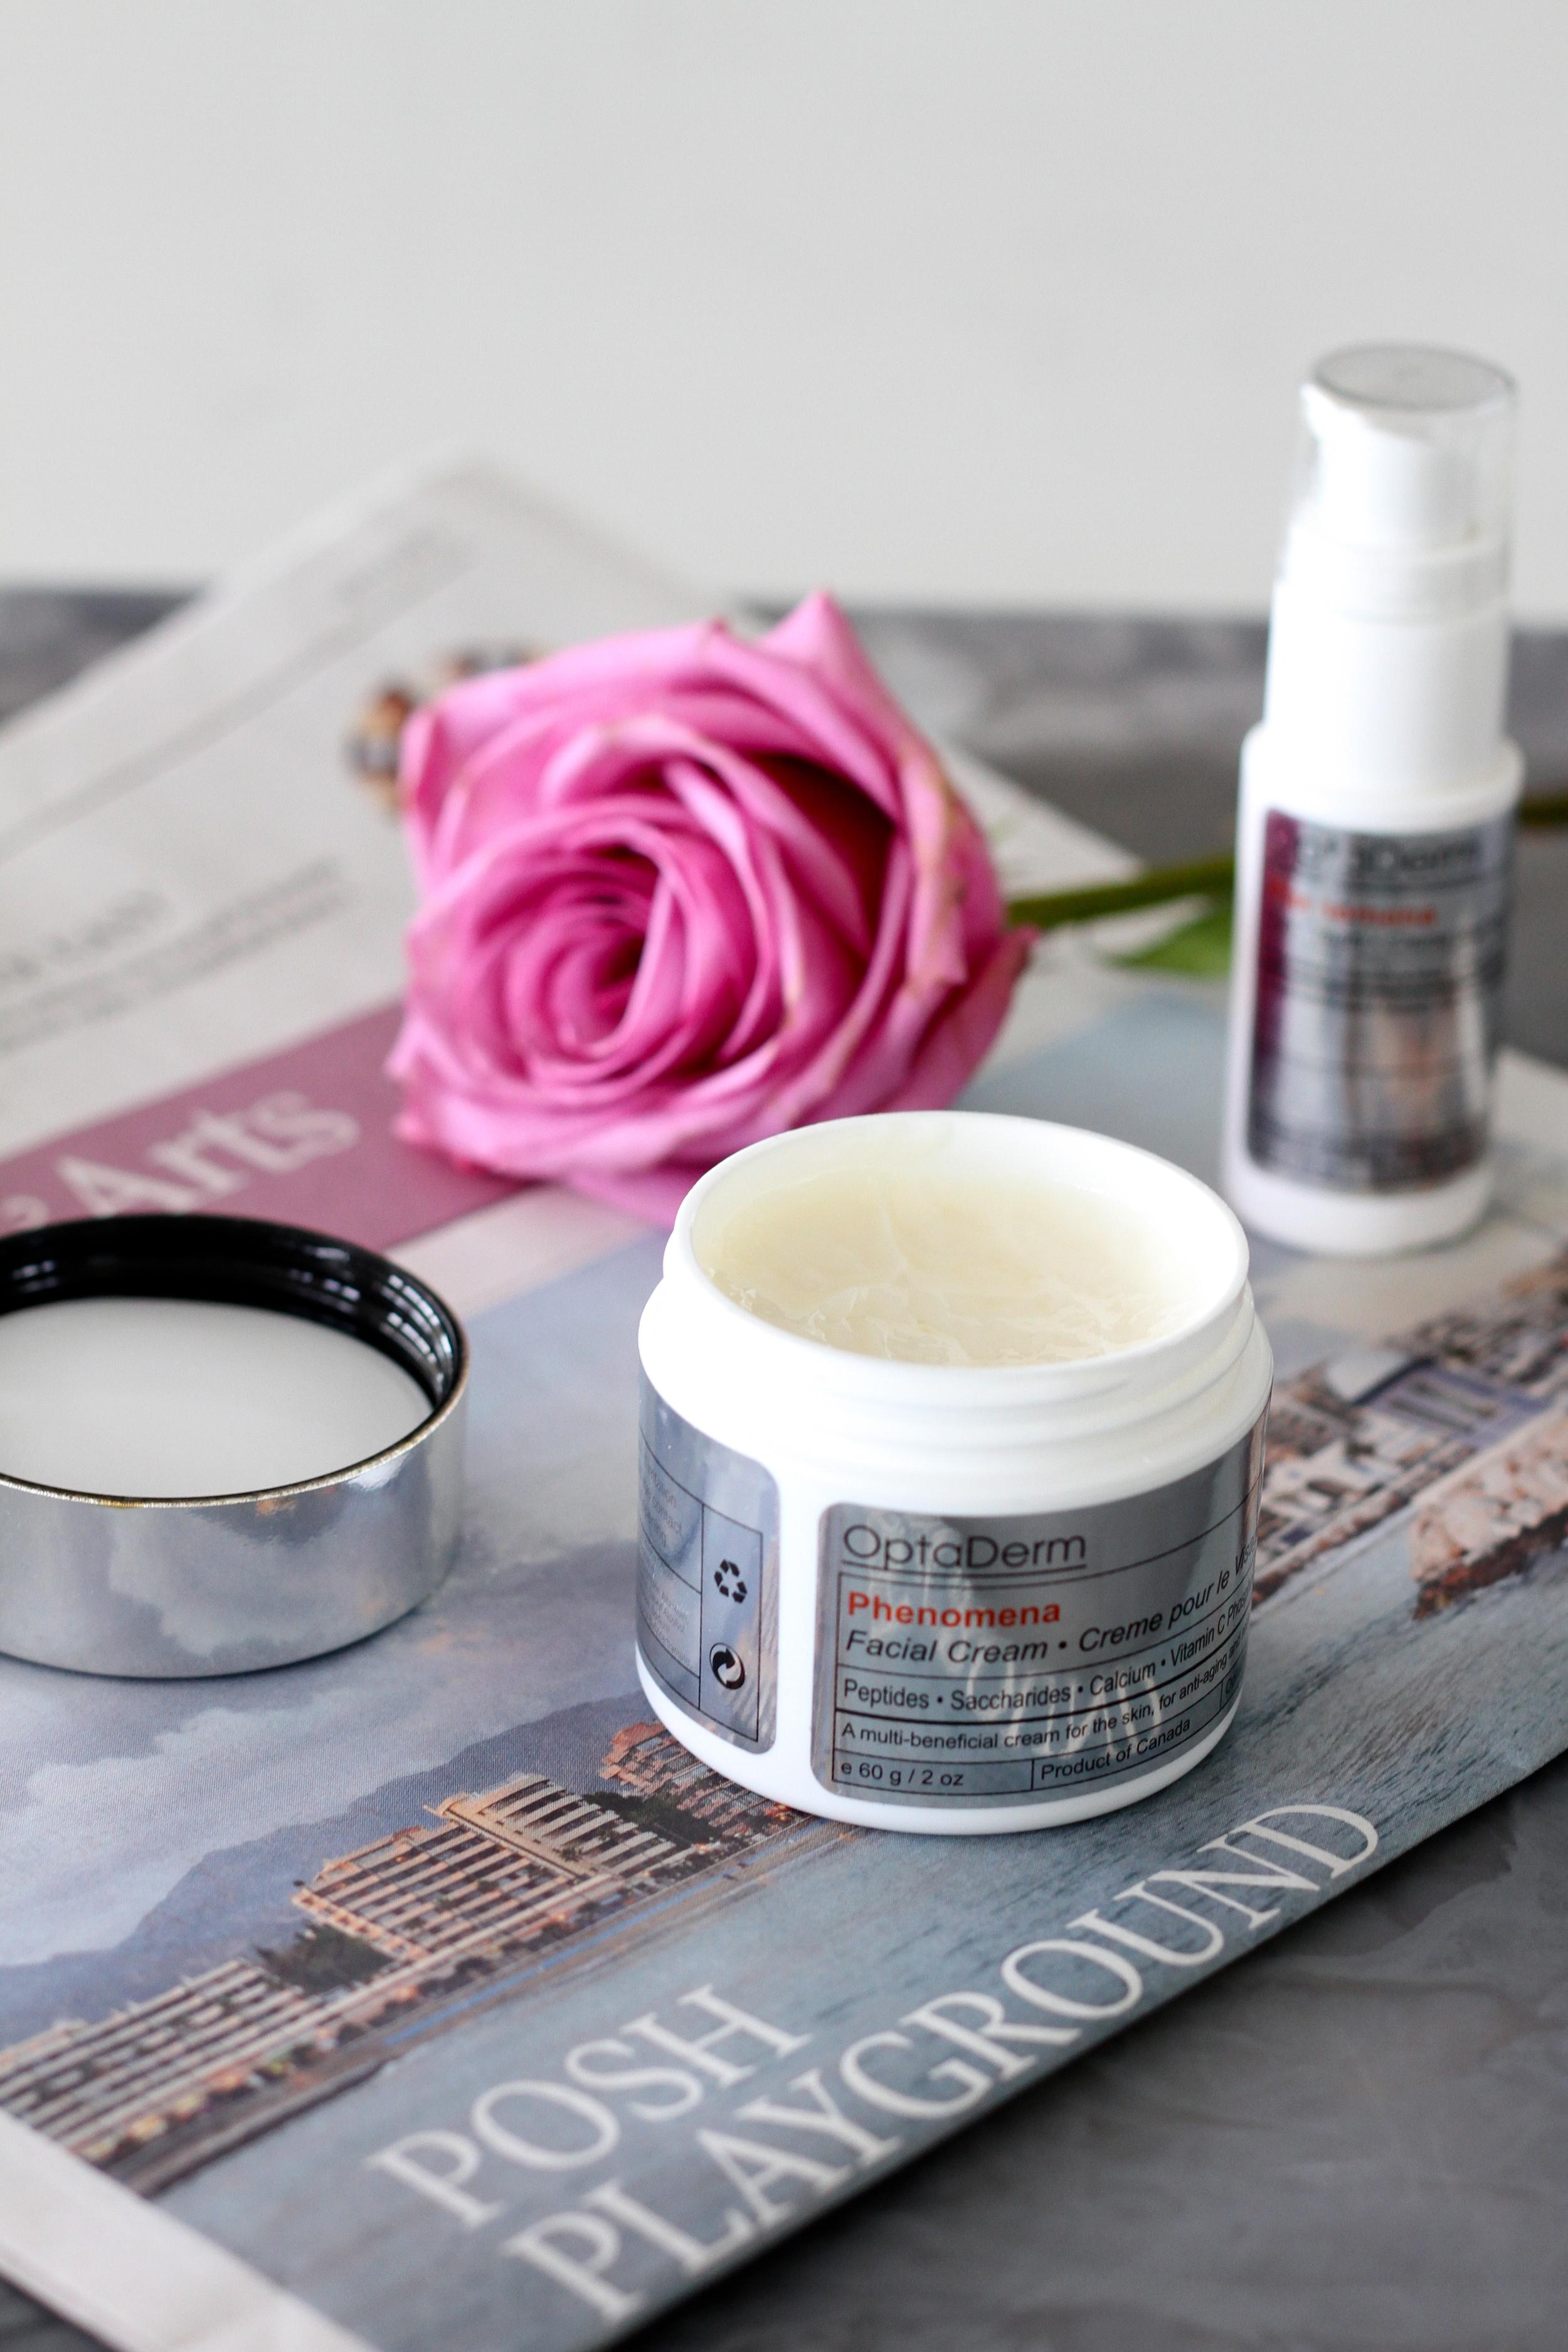 Optaderm Skincare Phenomena Facial Cream